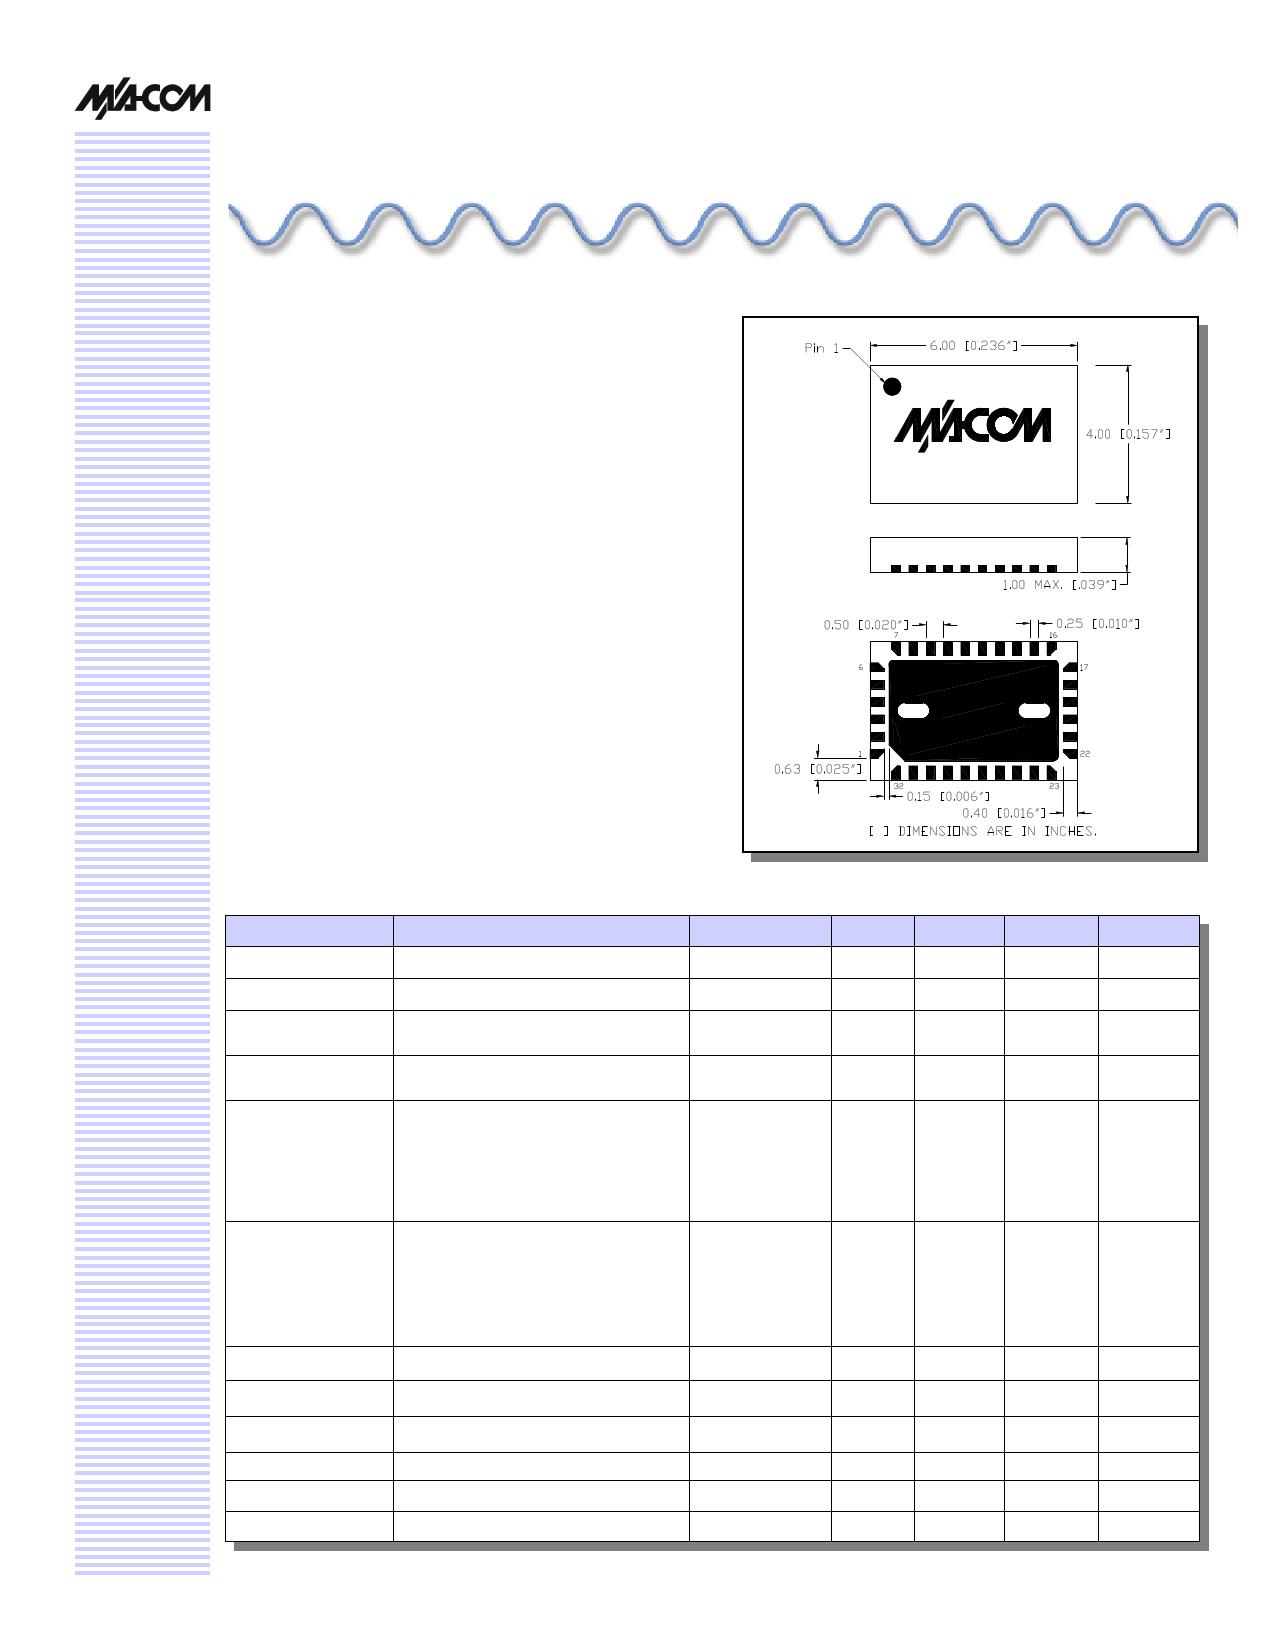 SA90-0001 datasheet